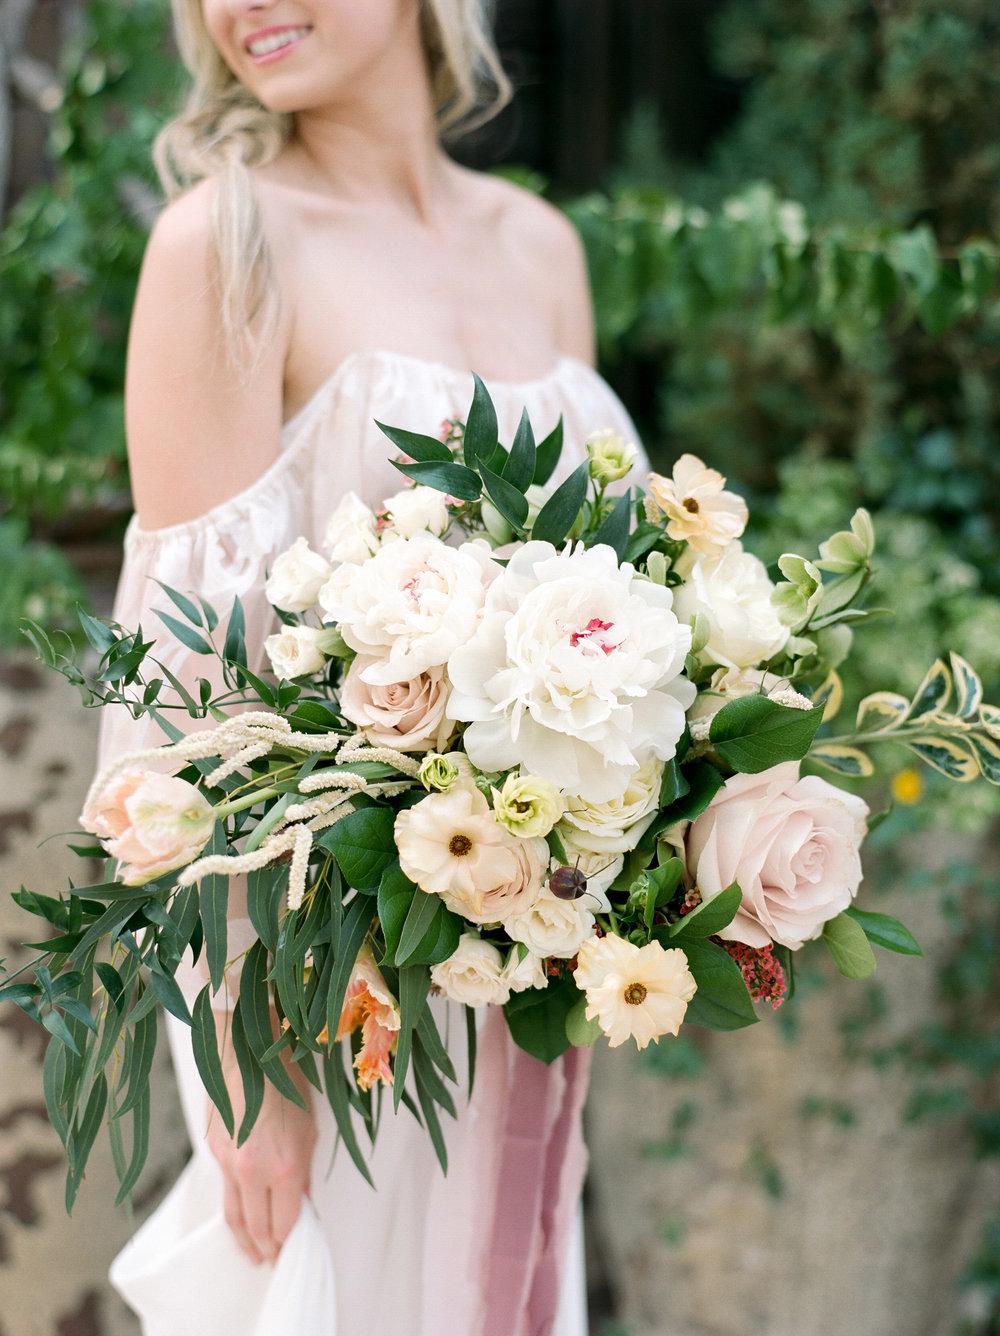 Houston-Wedding-Photographer-Fine-Art-Film-Destination-Style-Me-Pretty-Austin-Dallas-New-Orleans-Dana-Fernandez-Photography-7.jpg